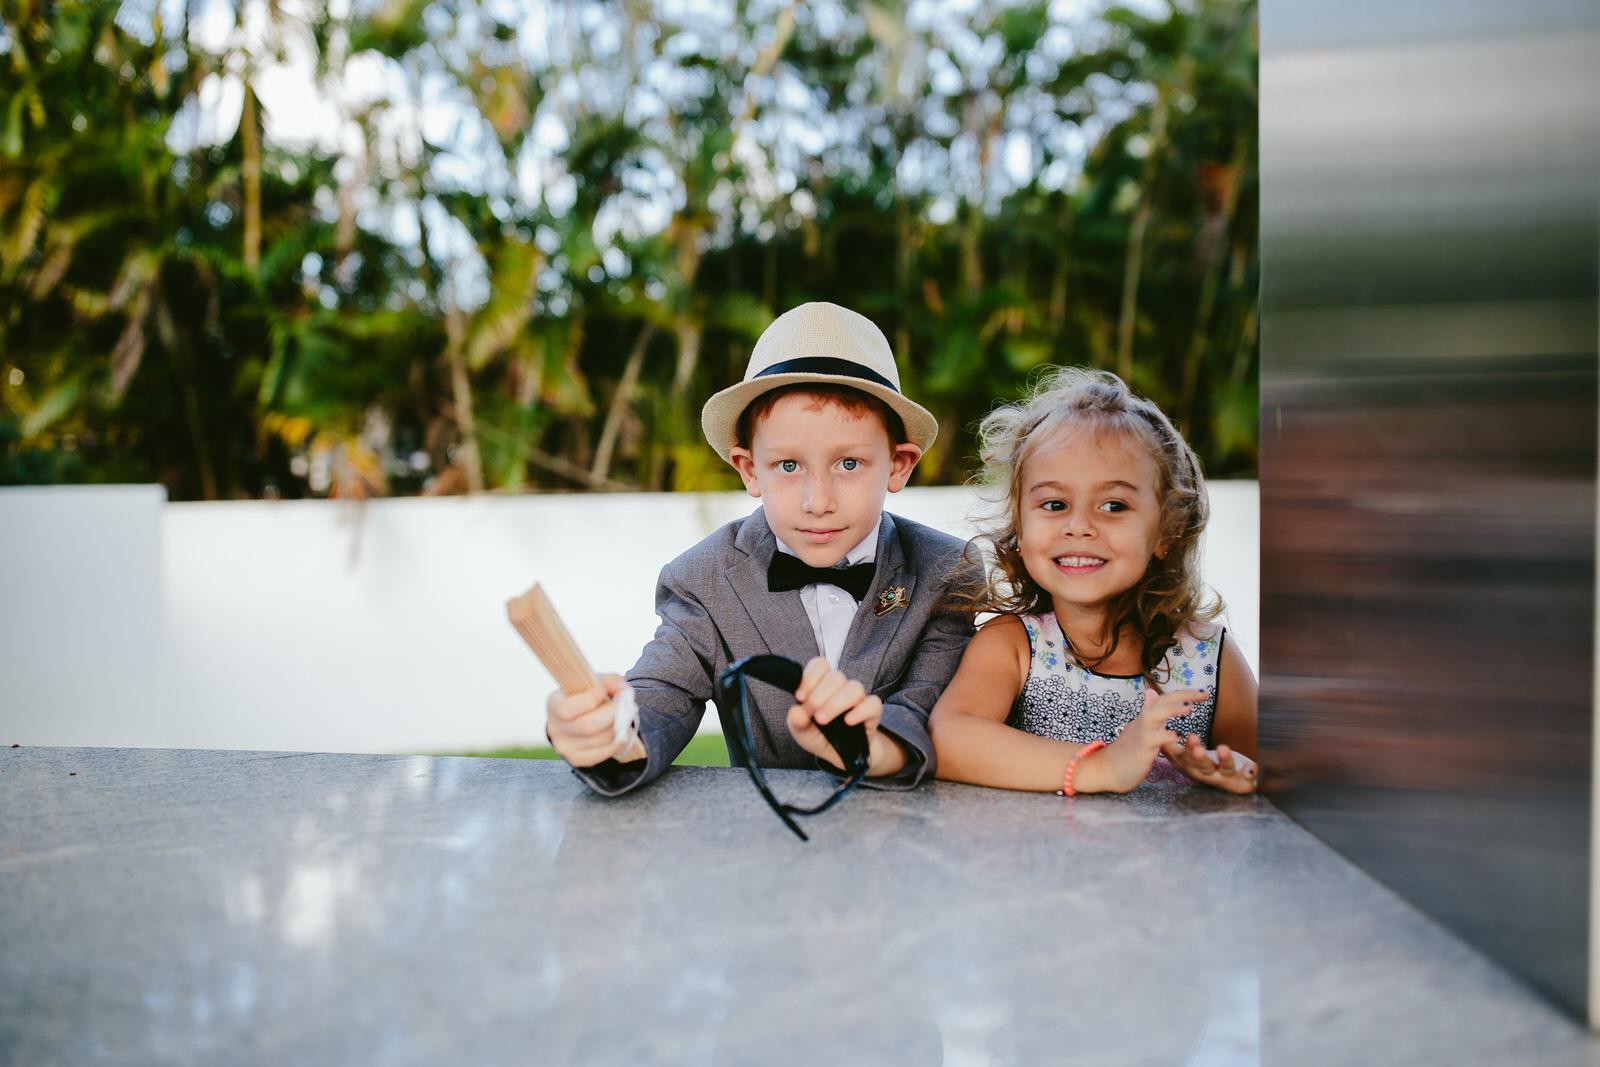 adorable-kids-at-weddings-tiny-house-photo-candid.jpg